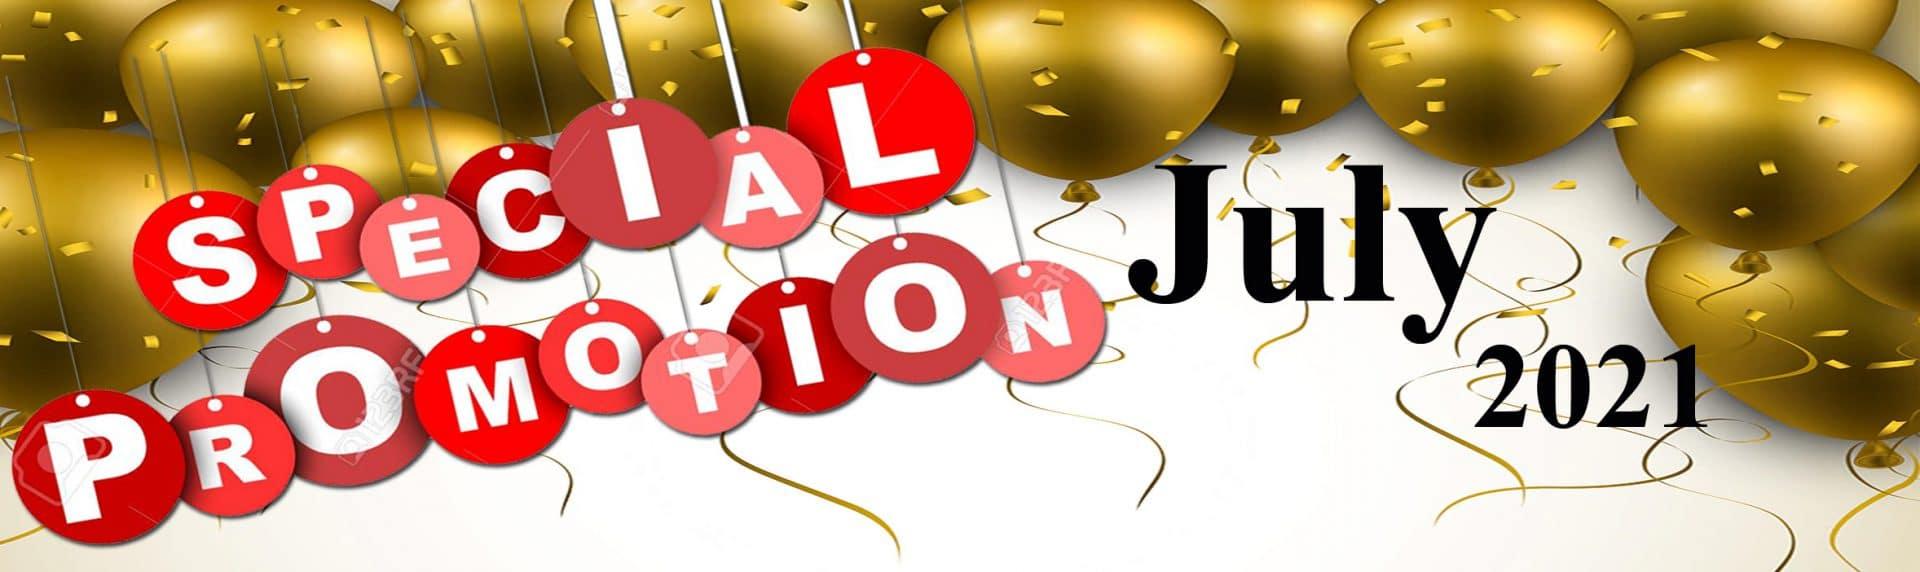 Promotion of July 2021 โปรโมชั่น เดือนกรกฎาคม 2564